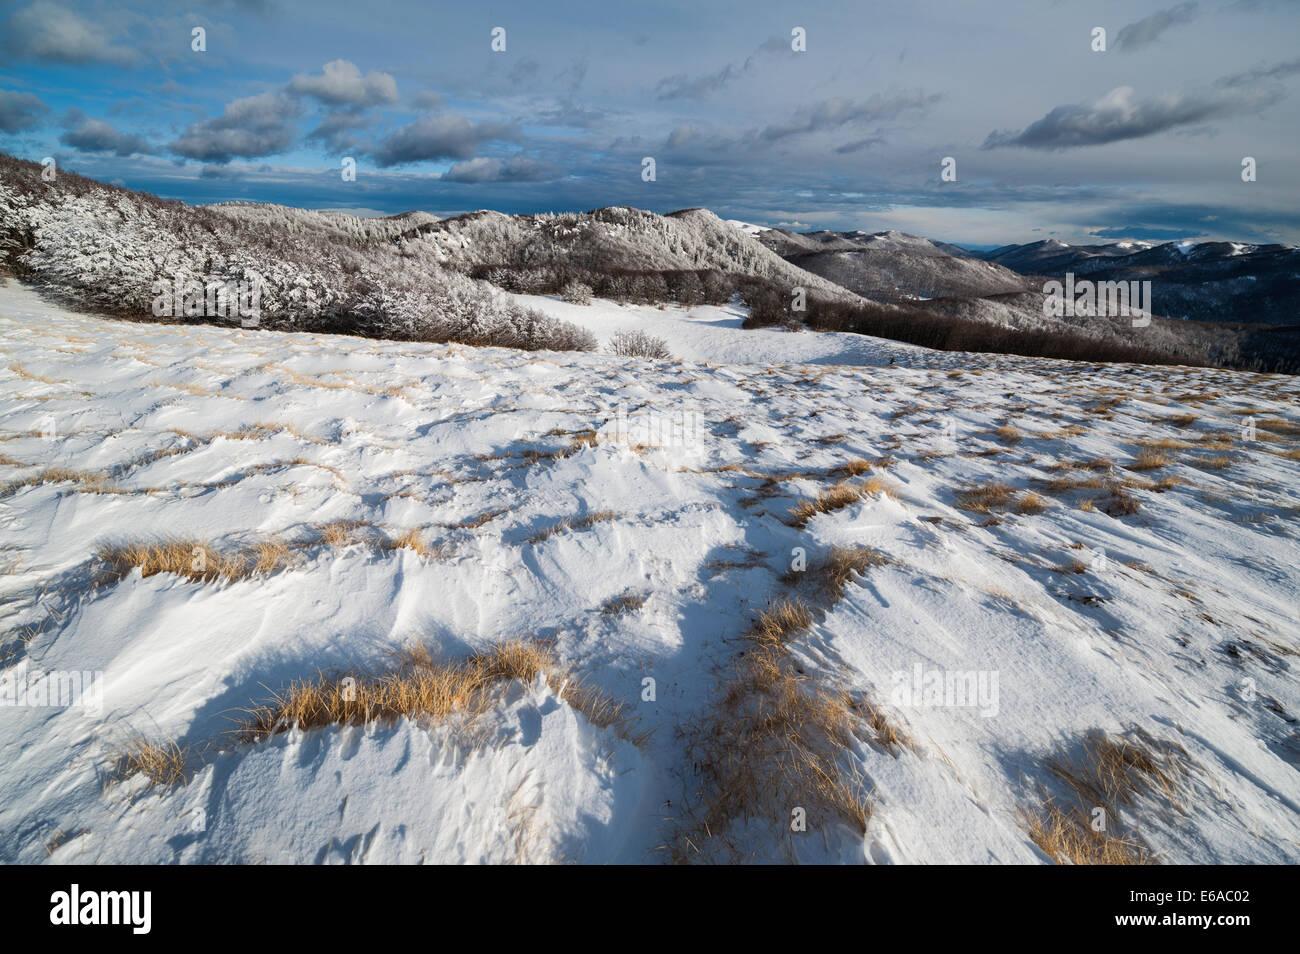 Winter atmosphere in Northern Velebit National park, Croatia. Stock Photo